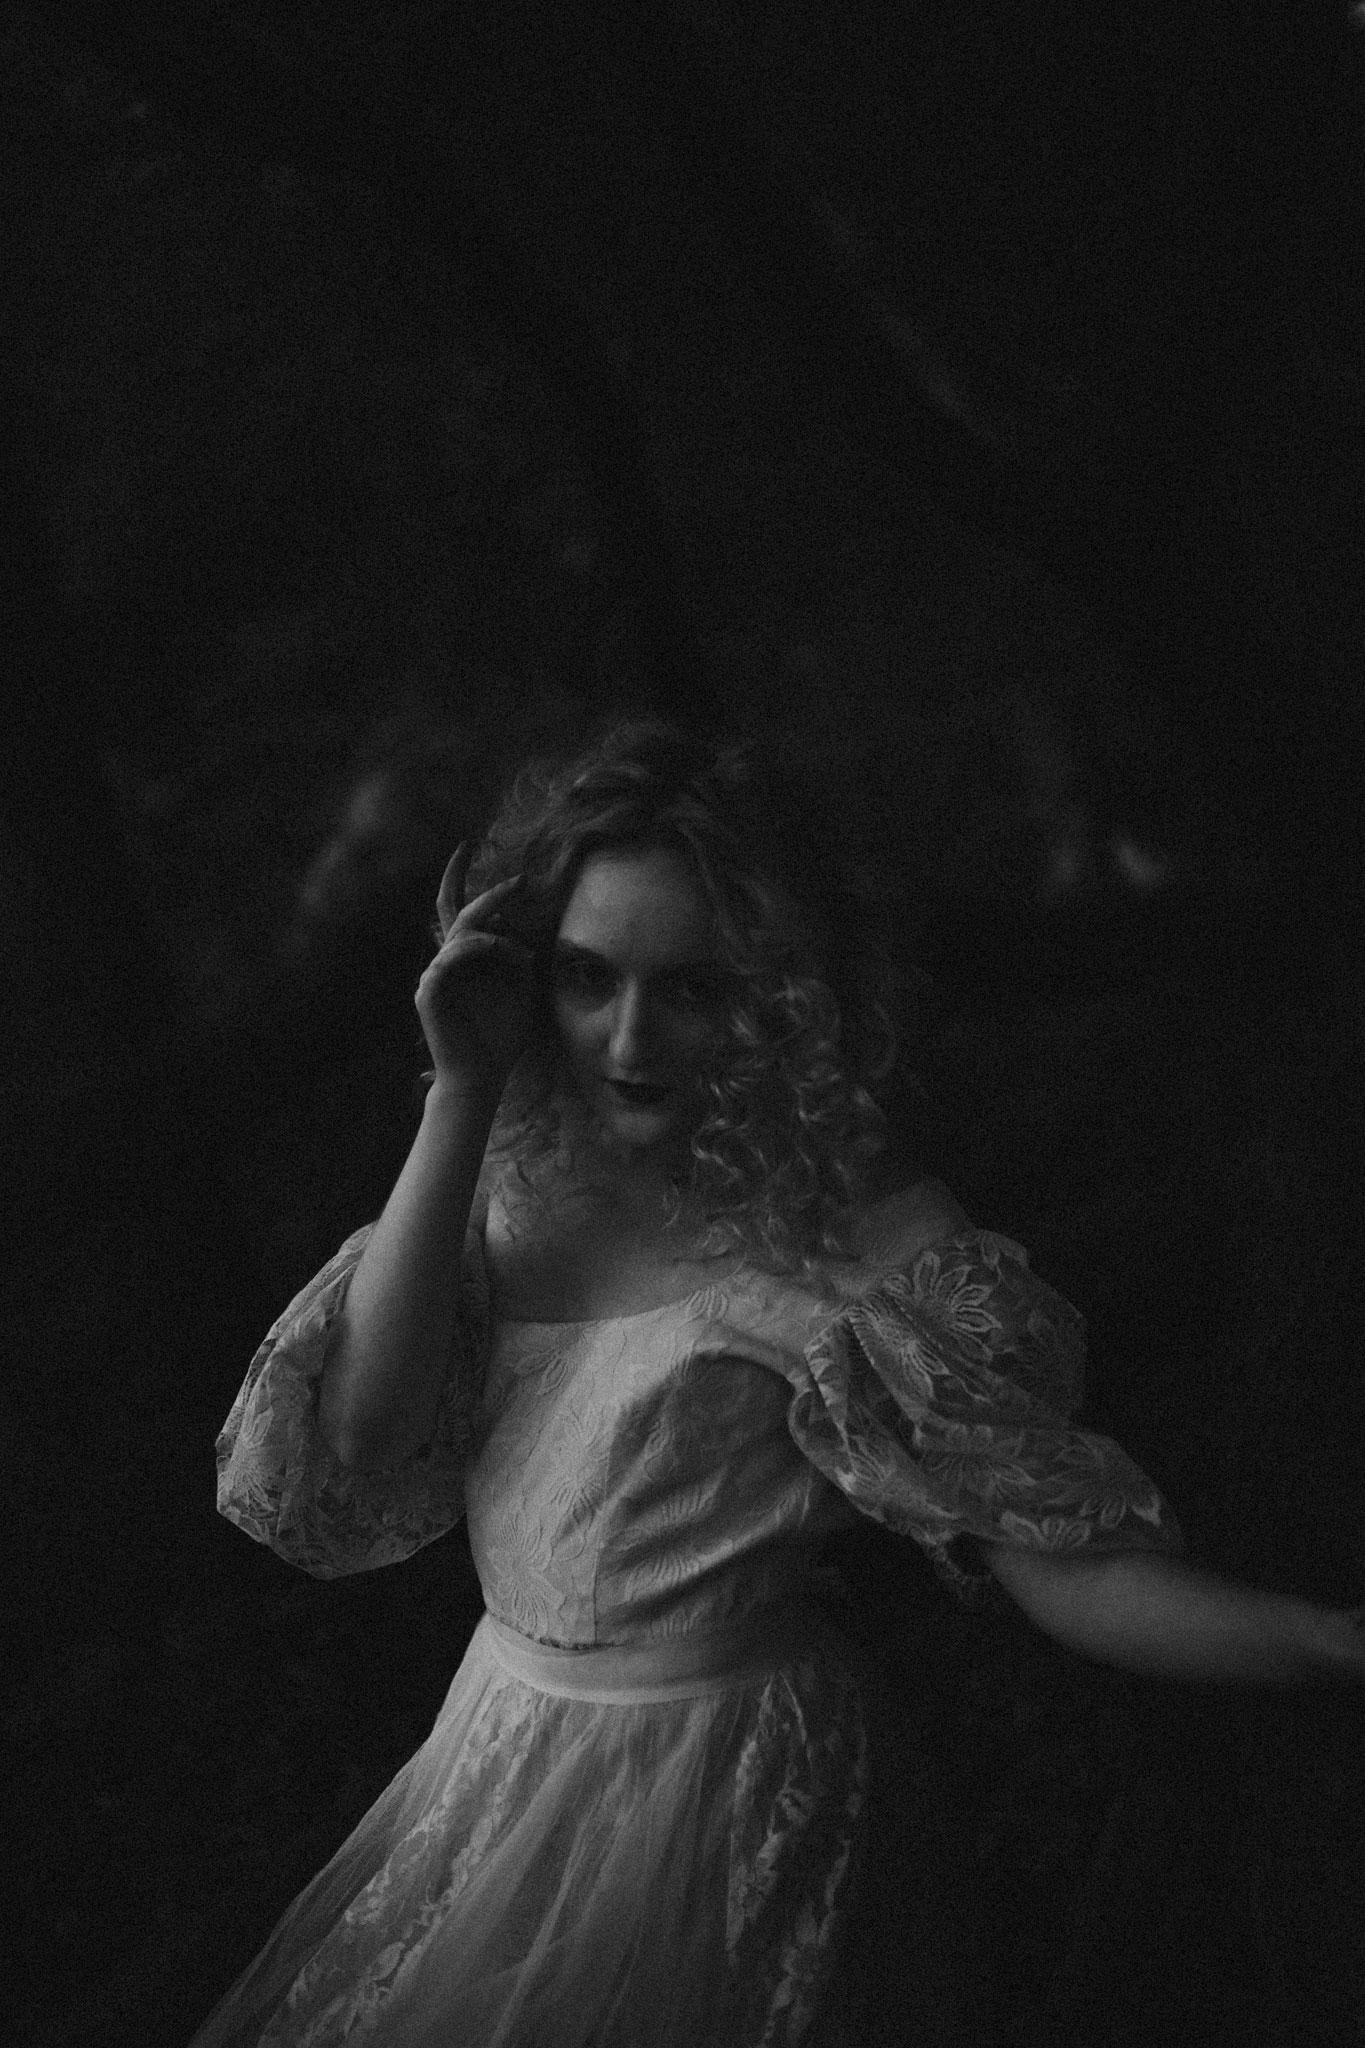 pale-witch-133fb.jpg